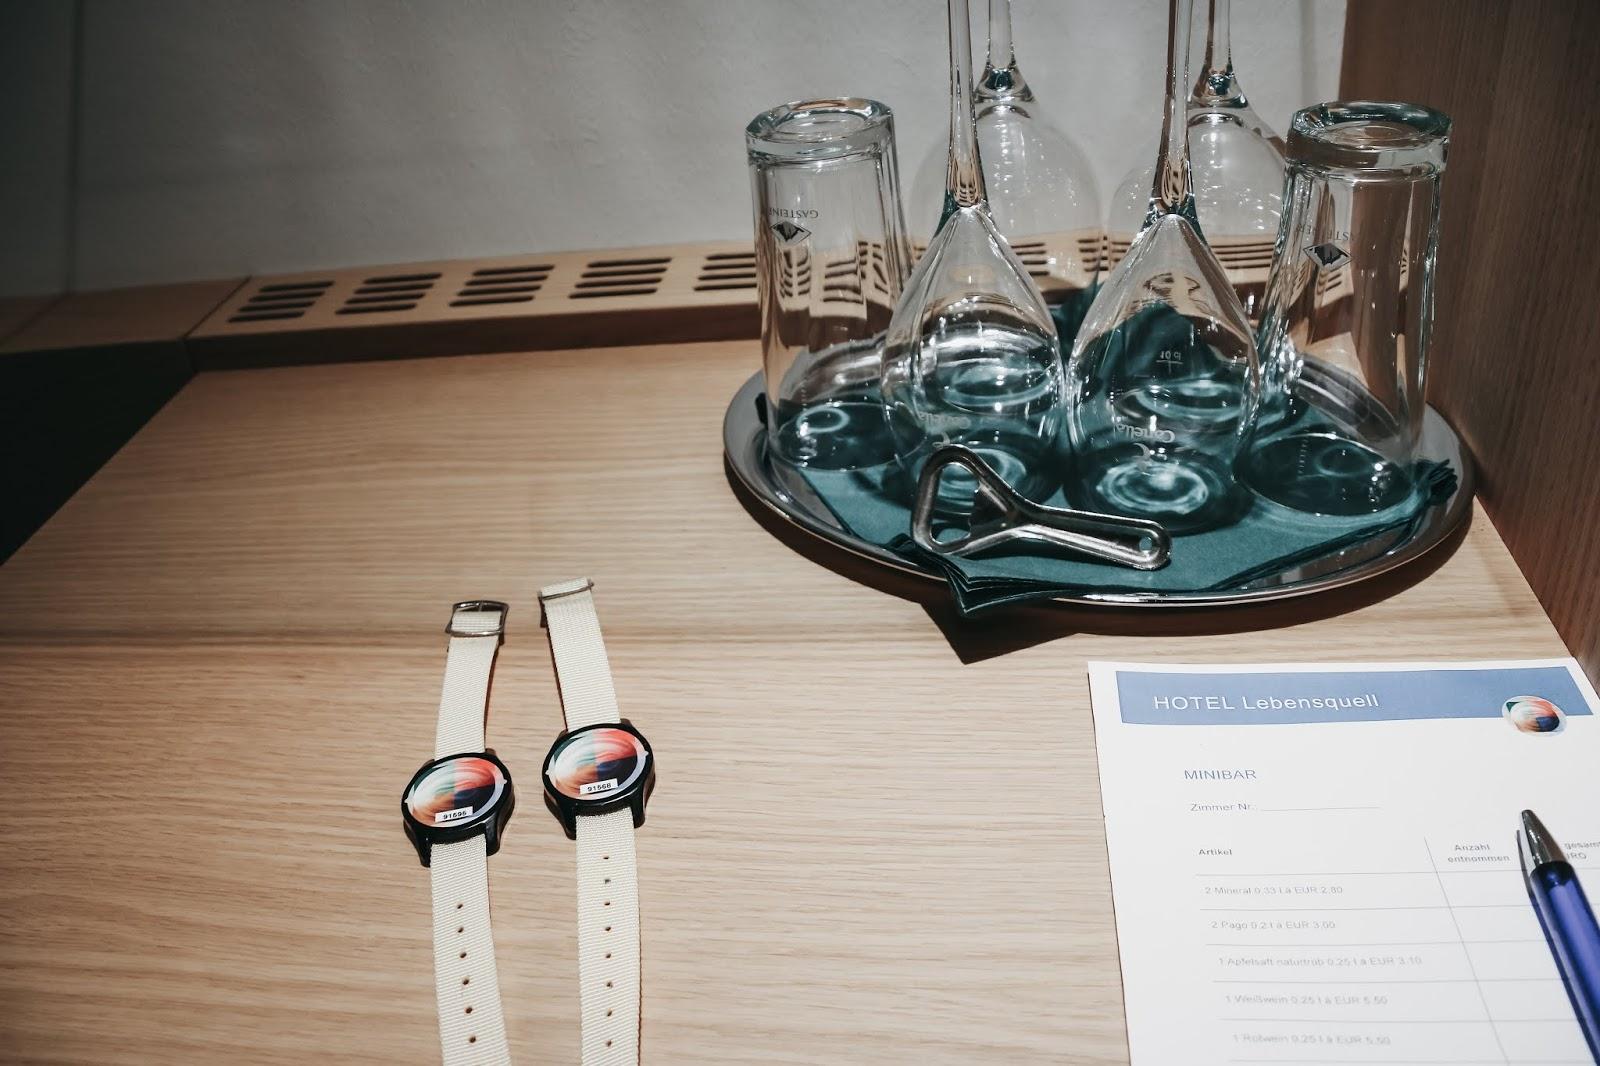 Lebensquell bad zell hotel review for Hotel lebensquell bad zell